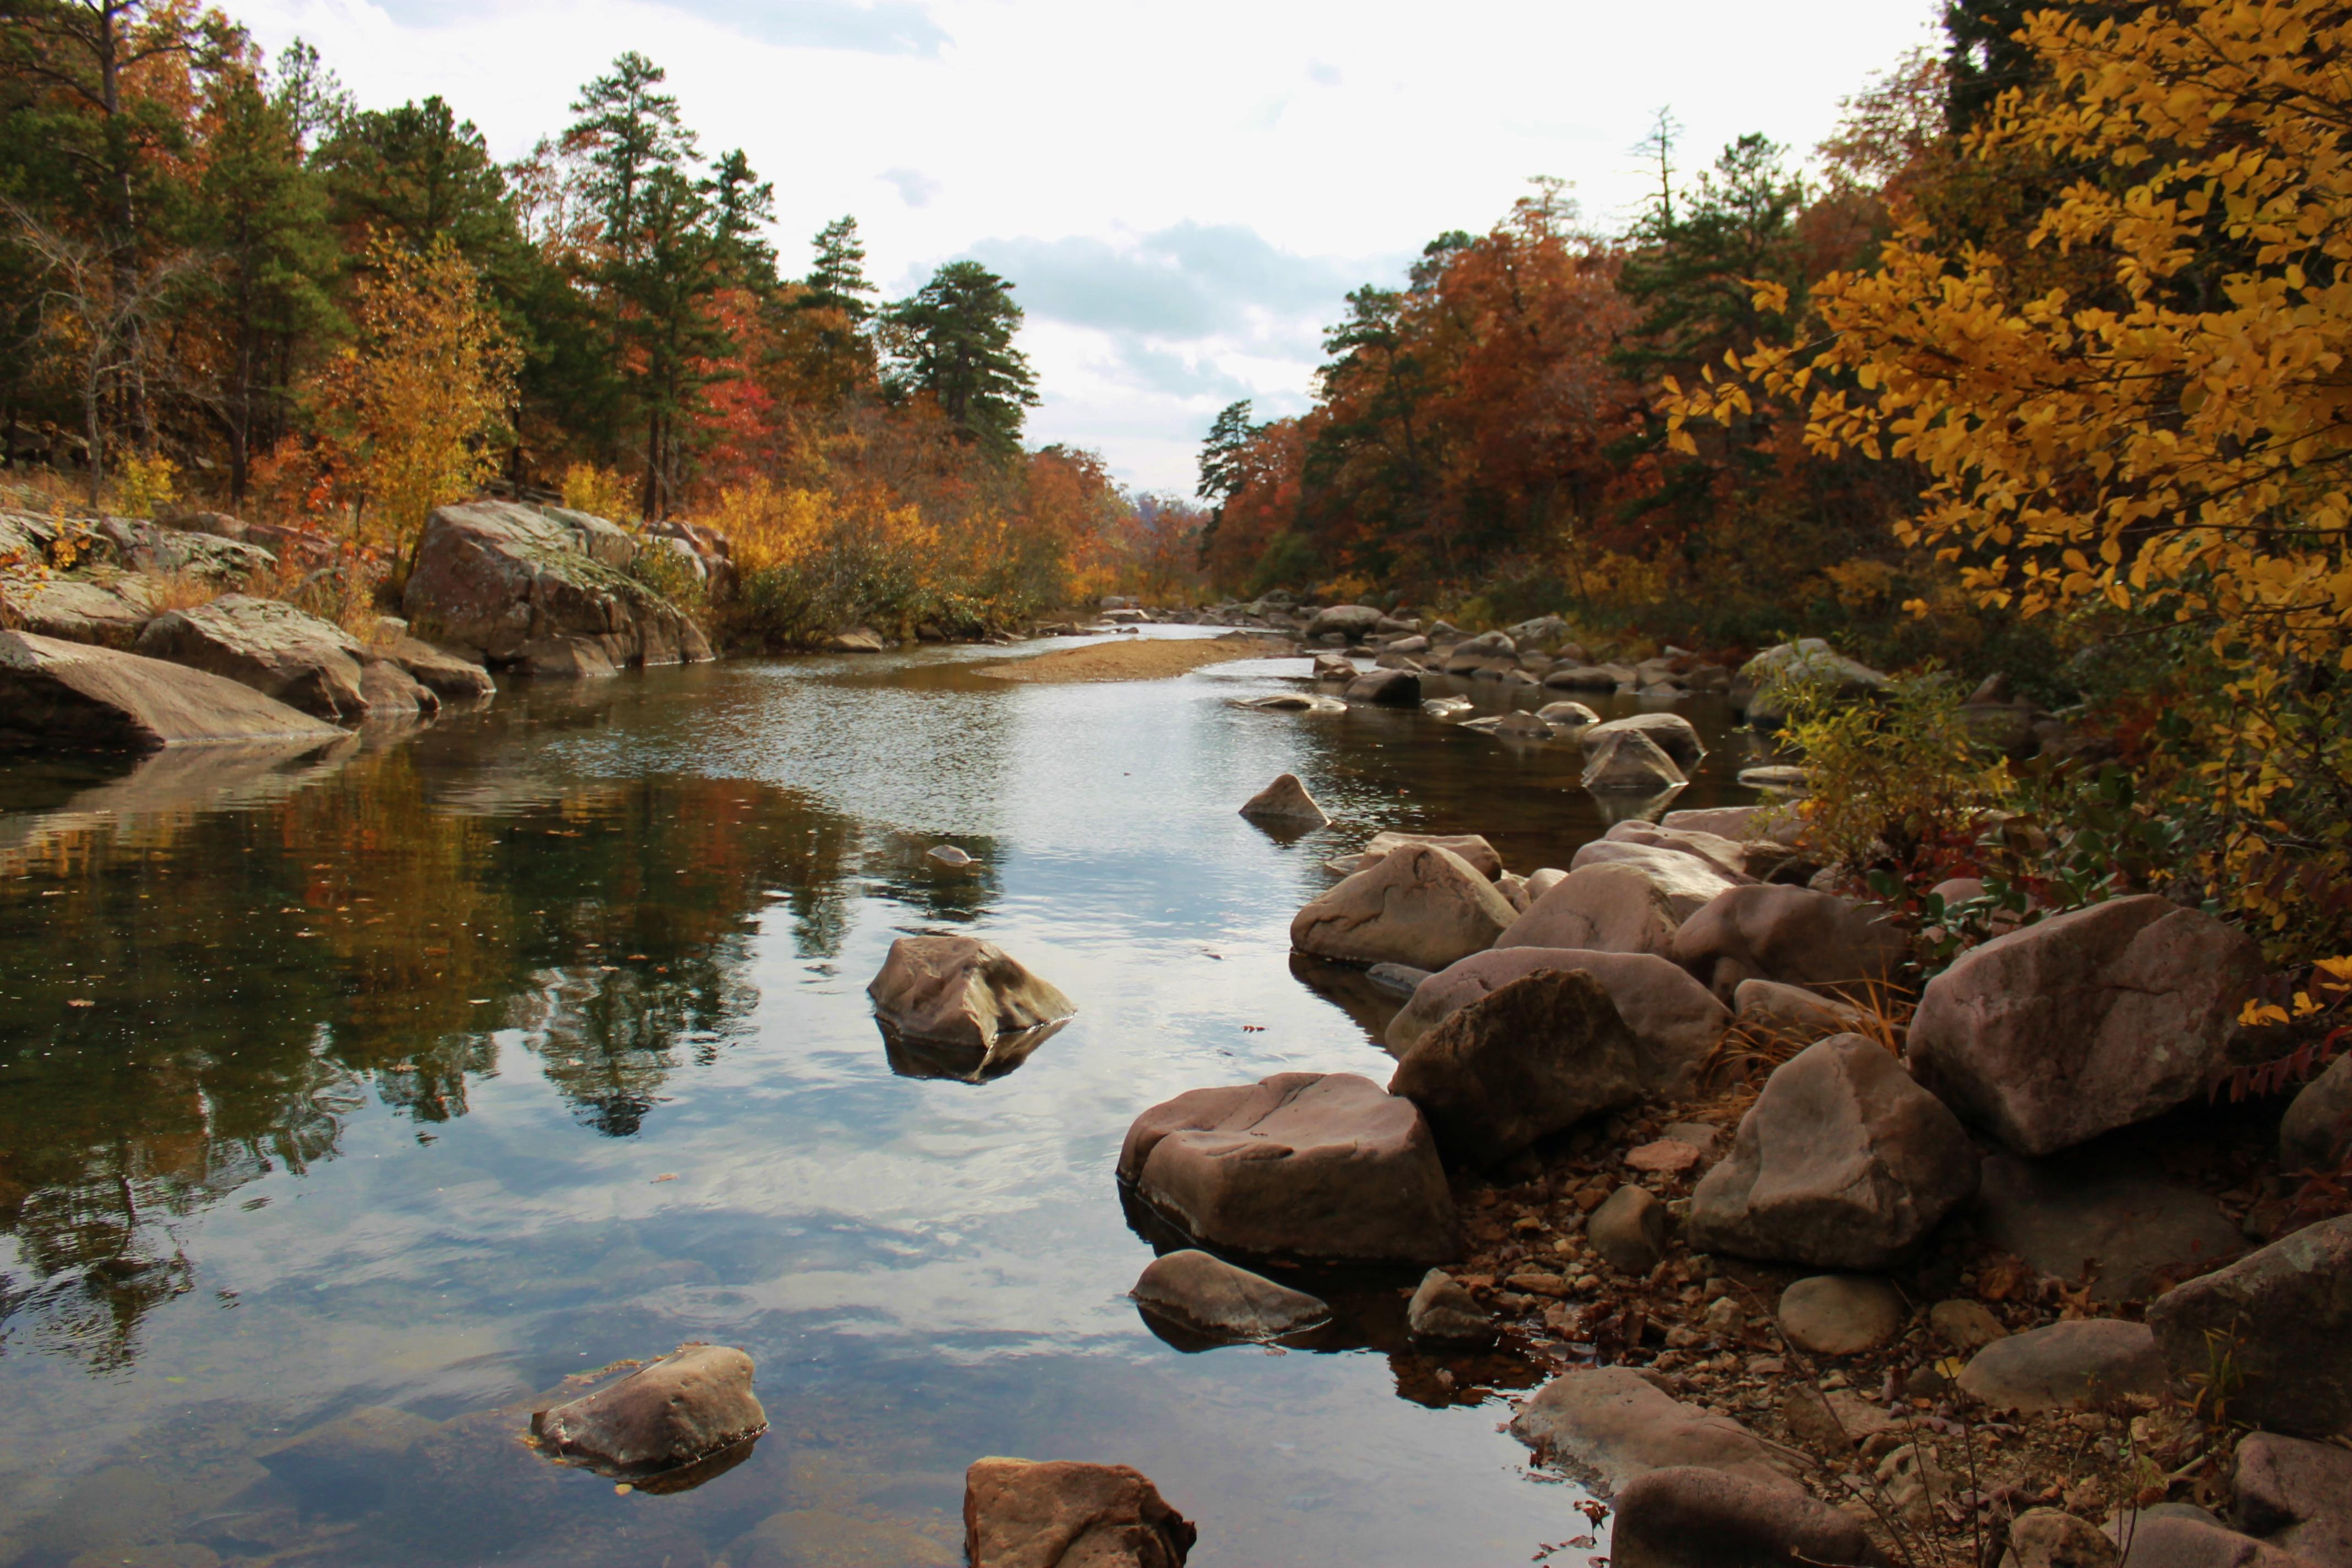 Autumn on the Castor River